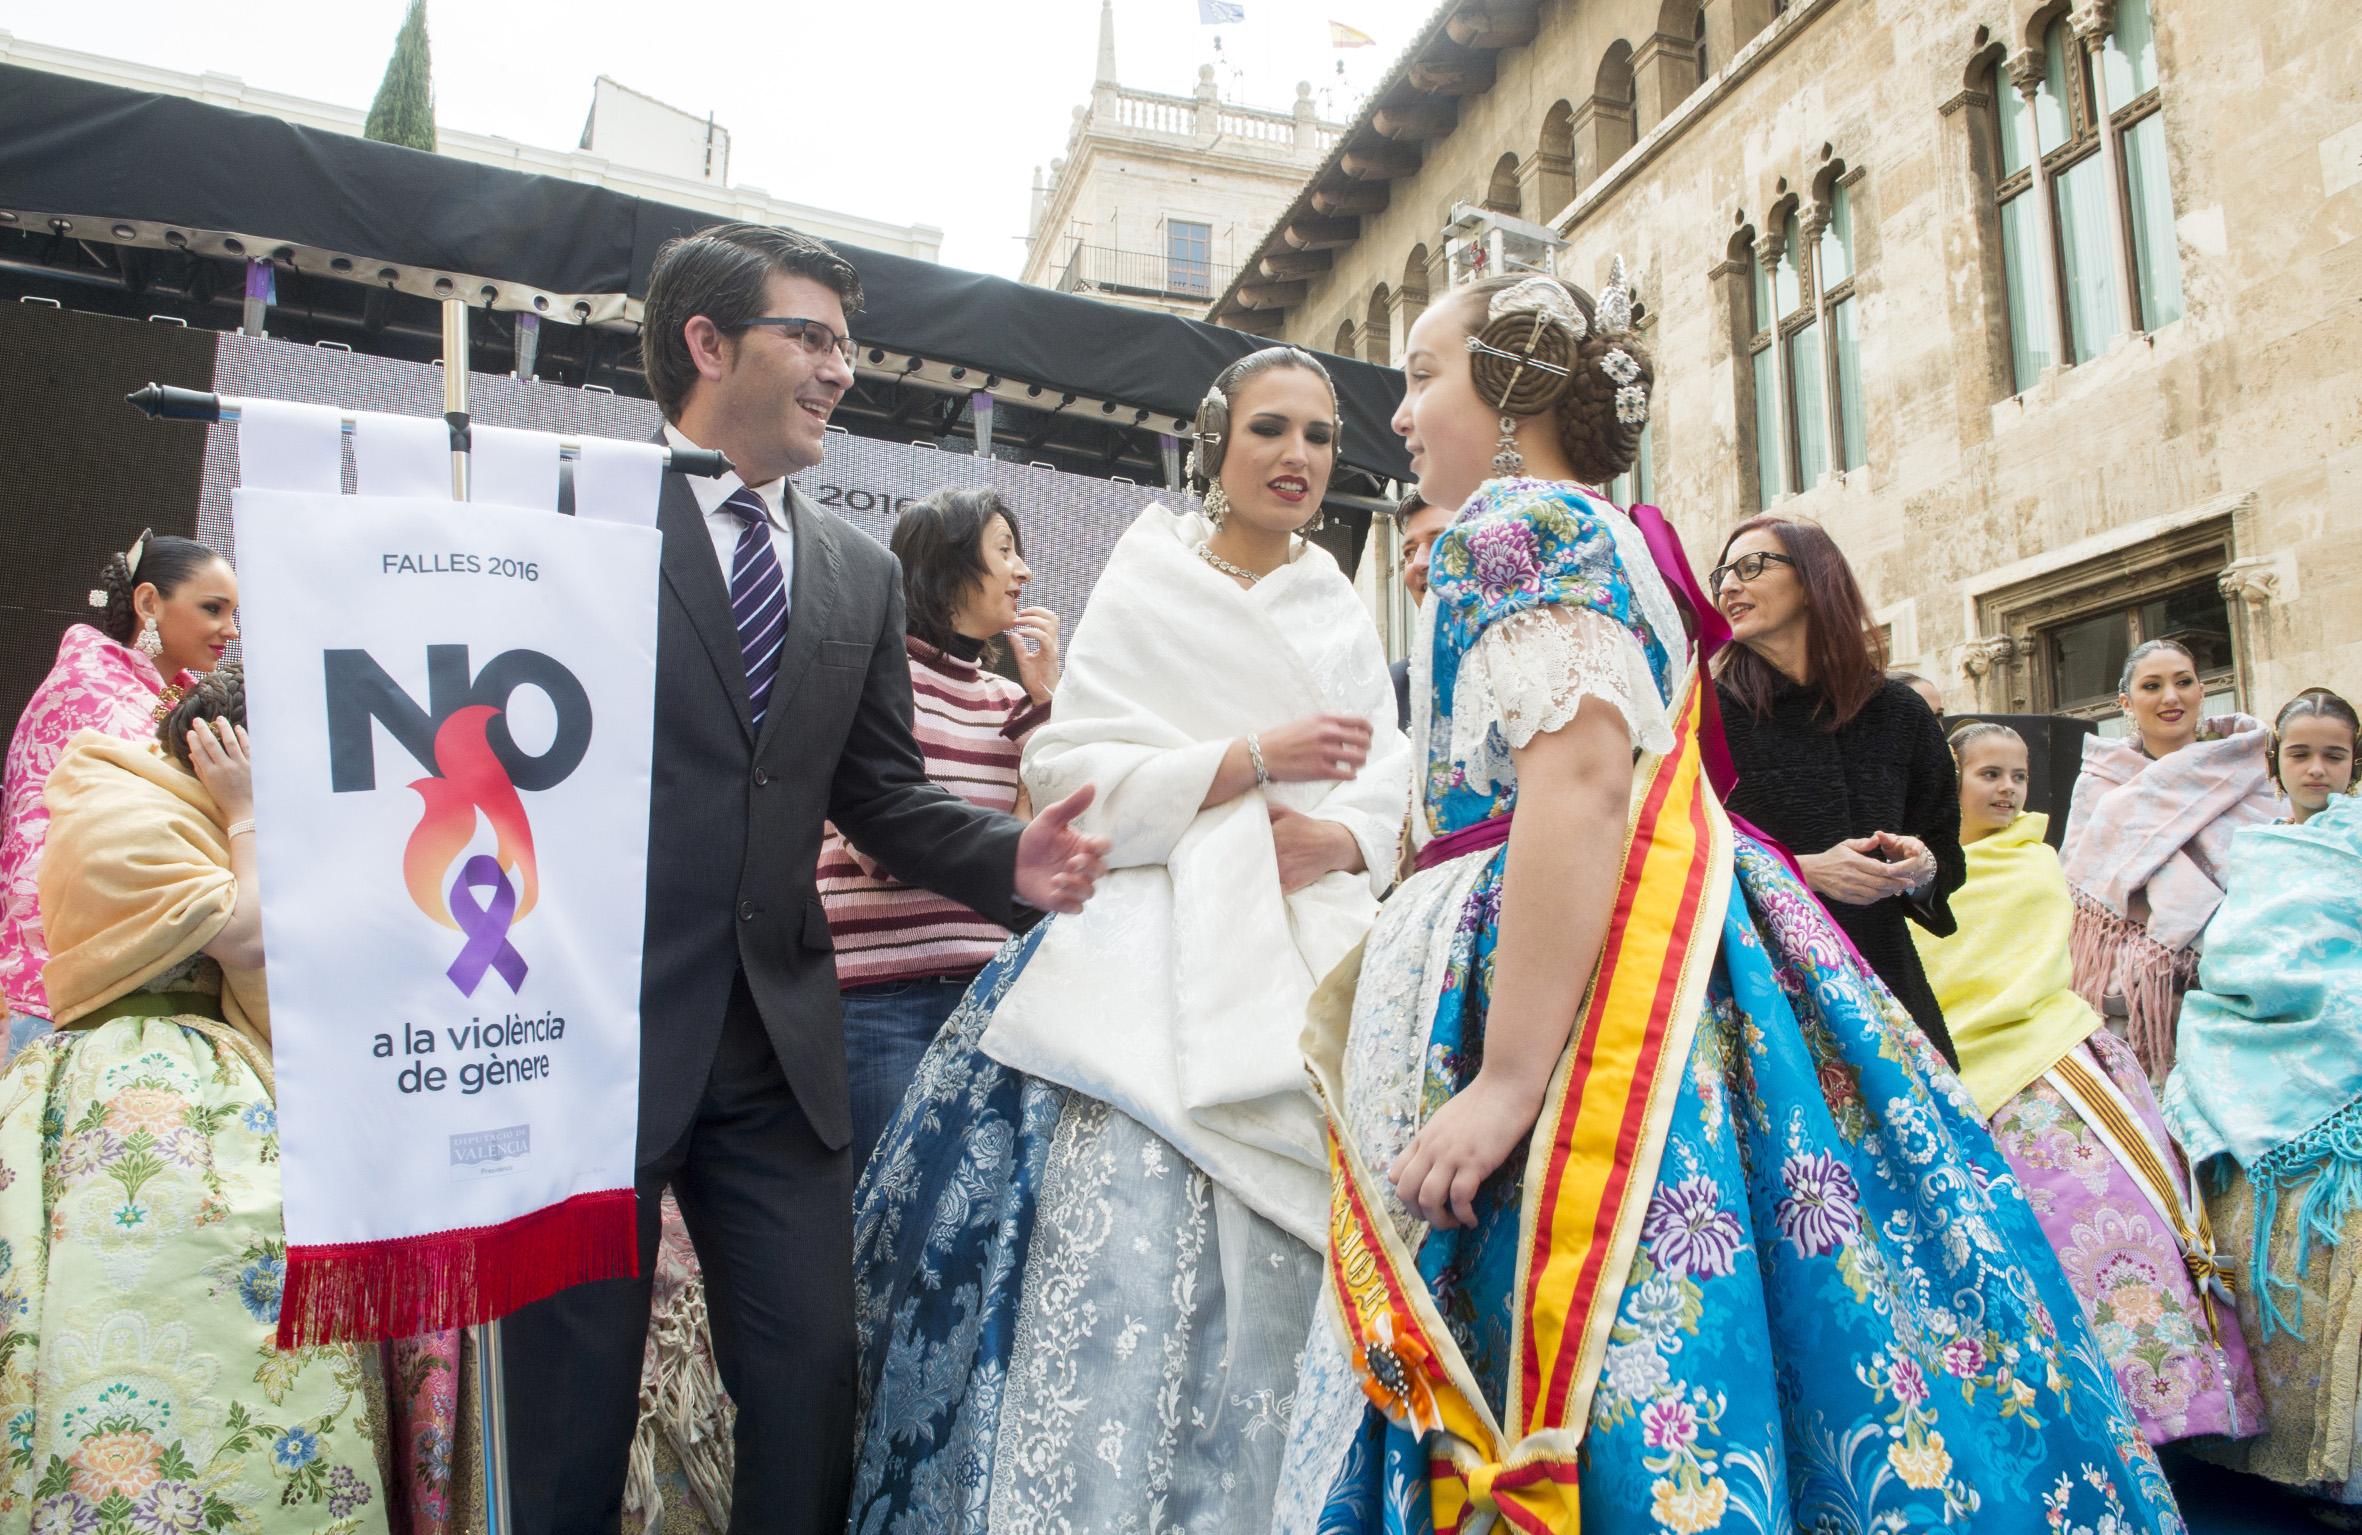 La Diputació celebra la tradicional recepción fallera.